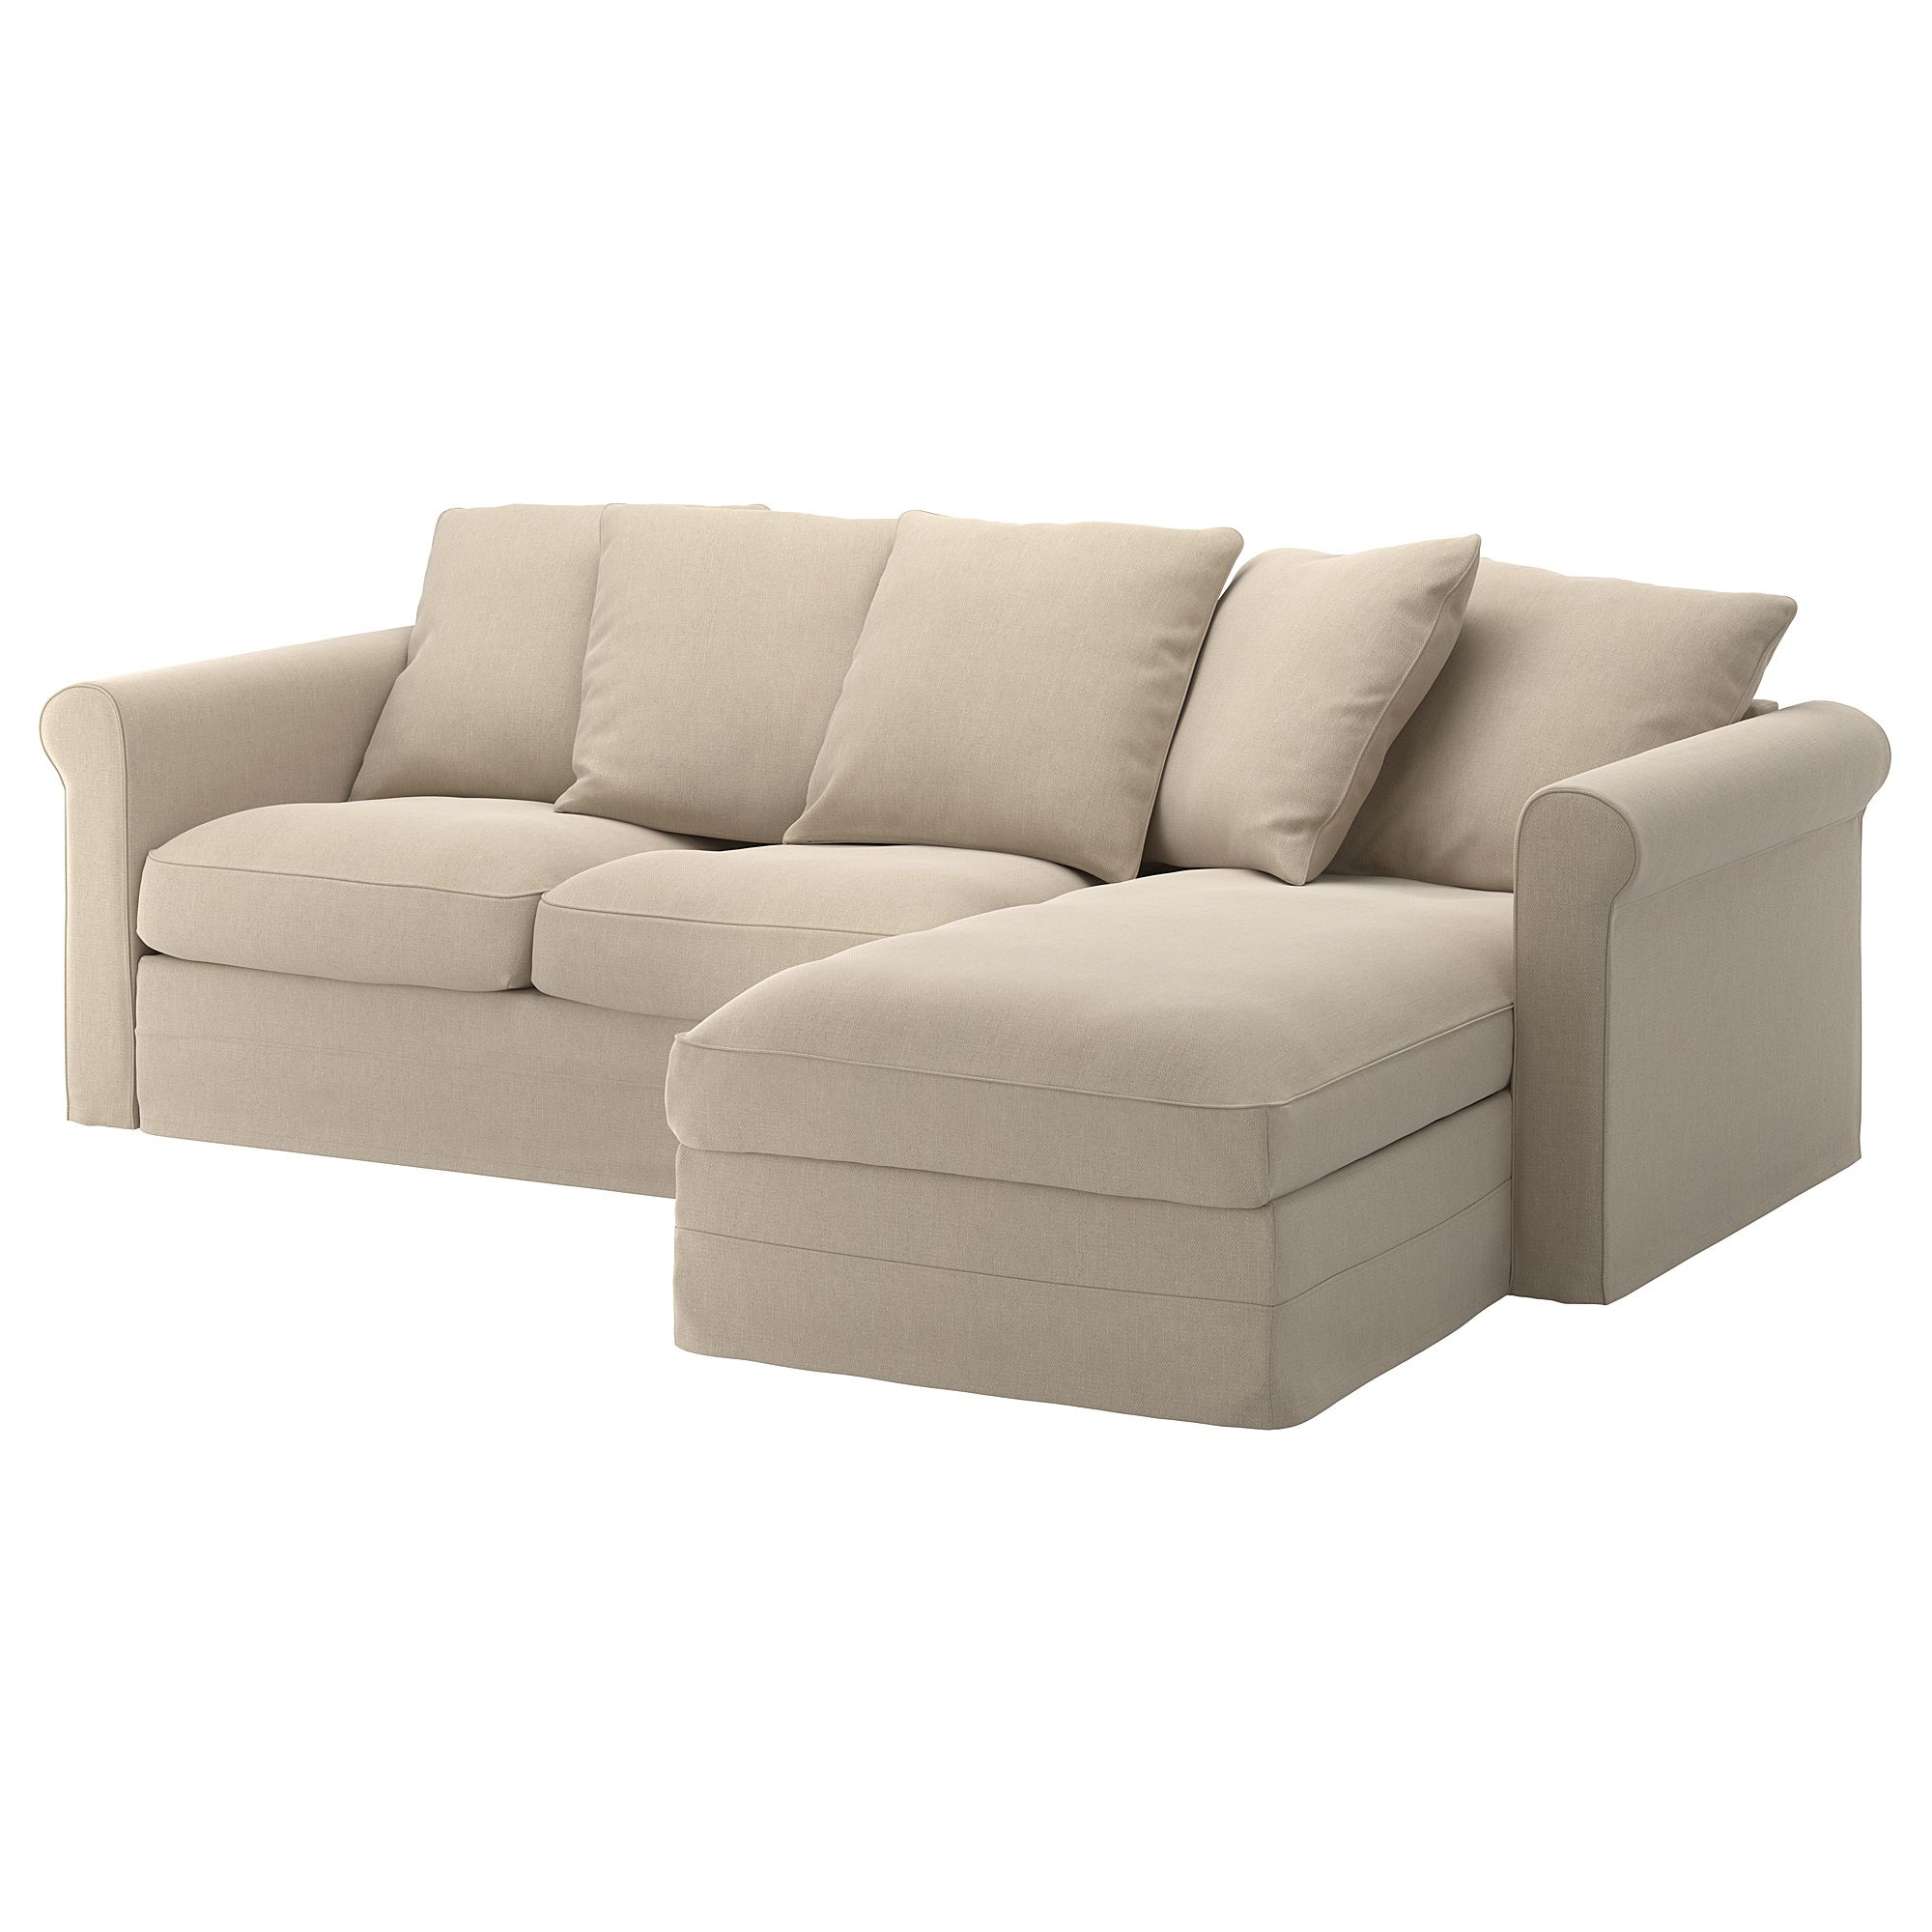 Gronlid 3er Sofa Mit Recamiere Sporda Naturfarben Ikea